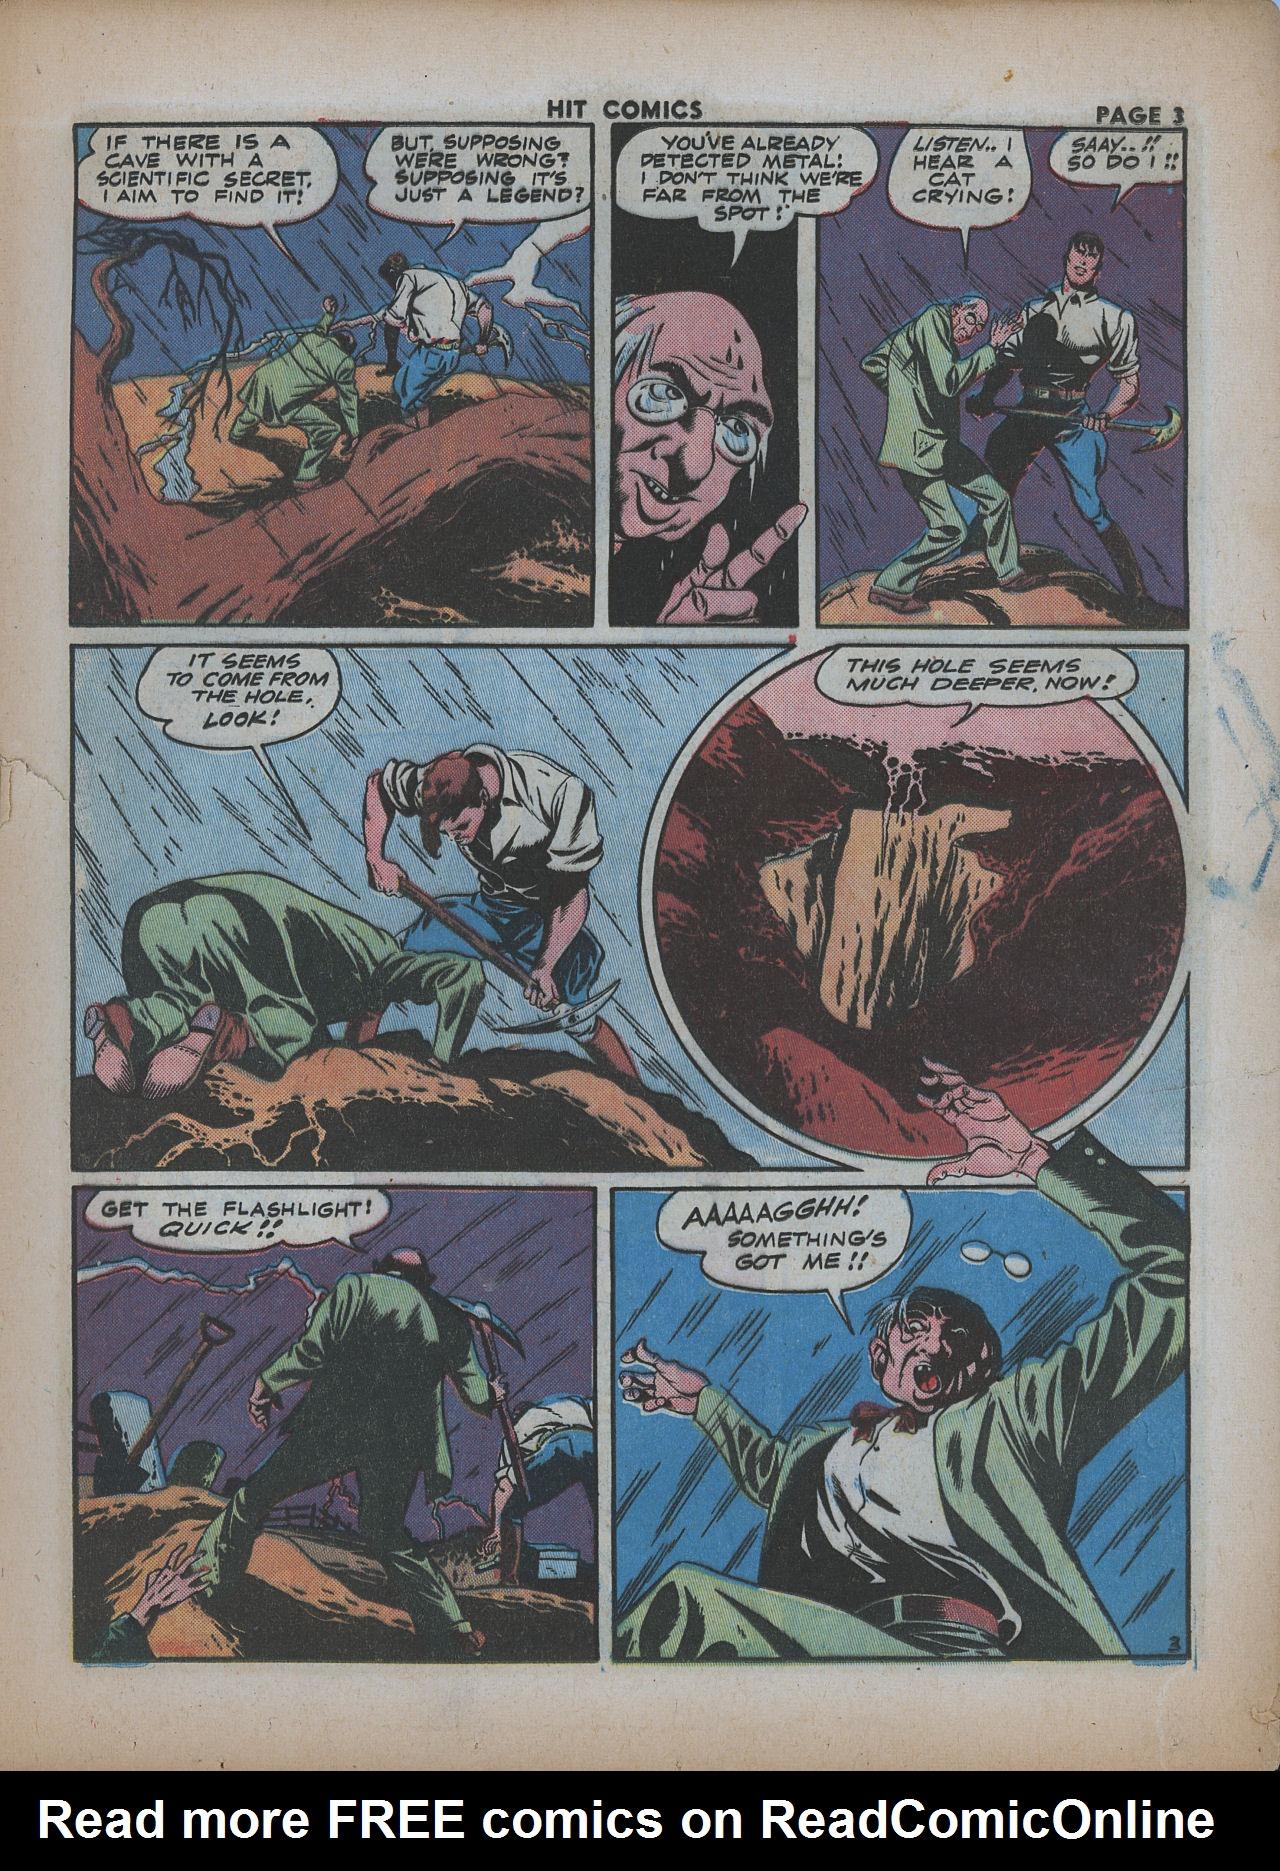 Read online Hit Comics comic -  Issue #26 - 5